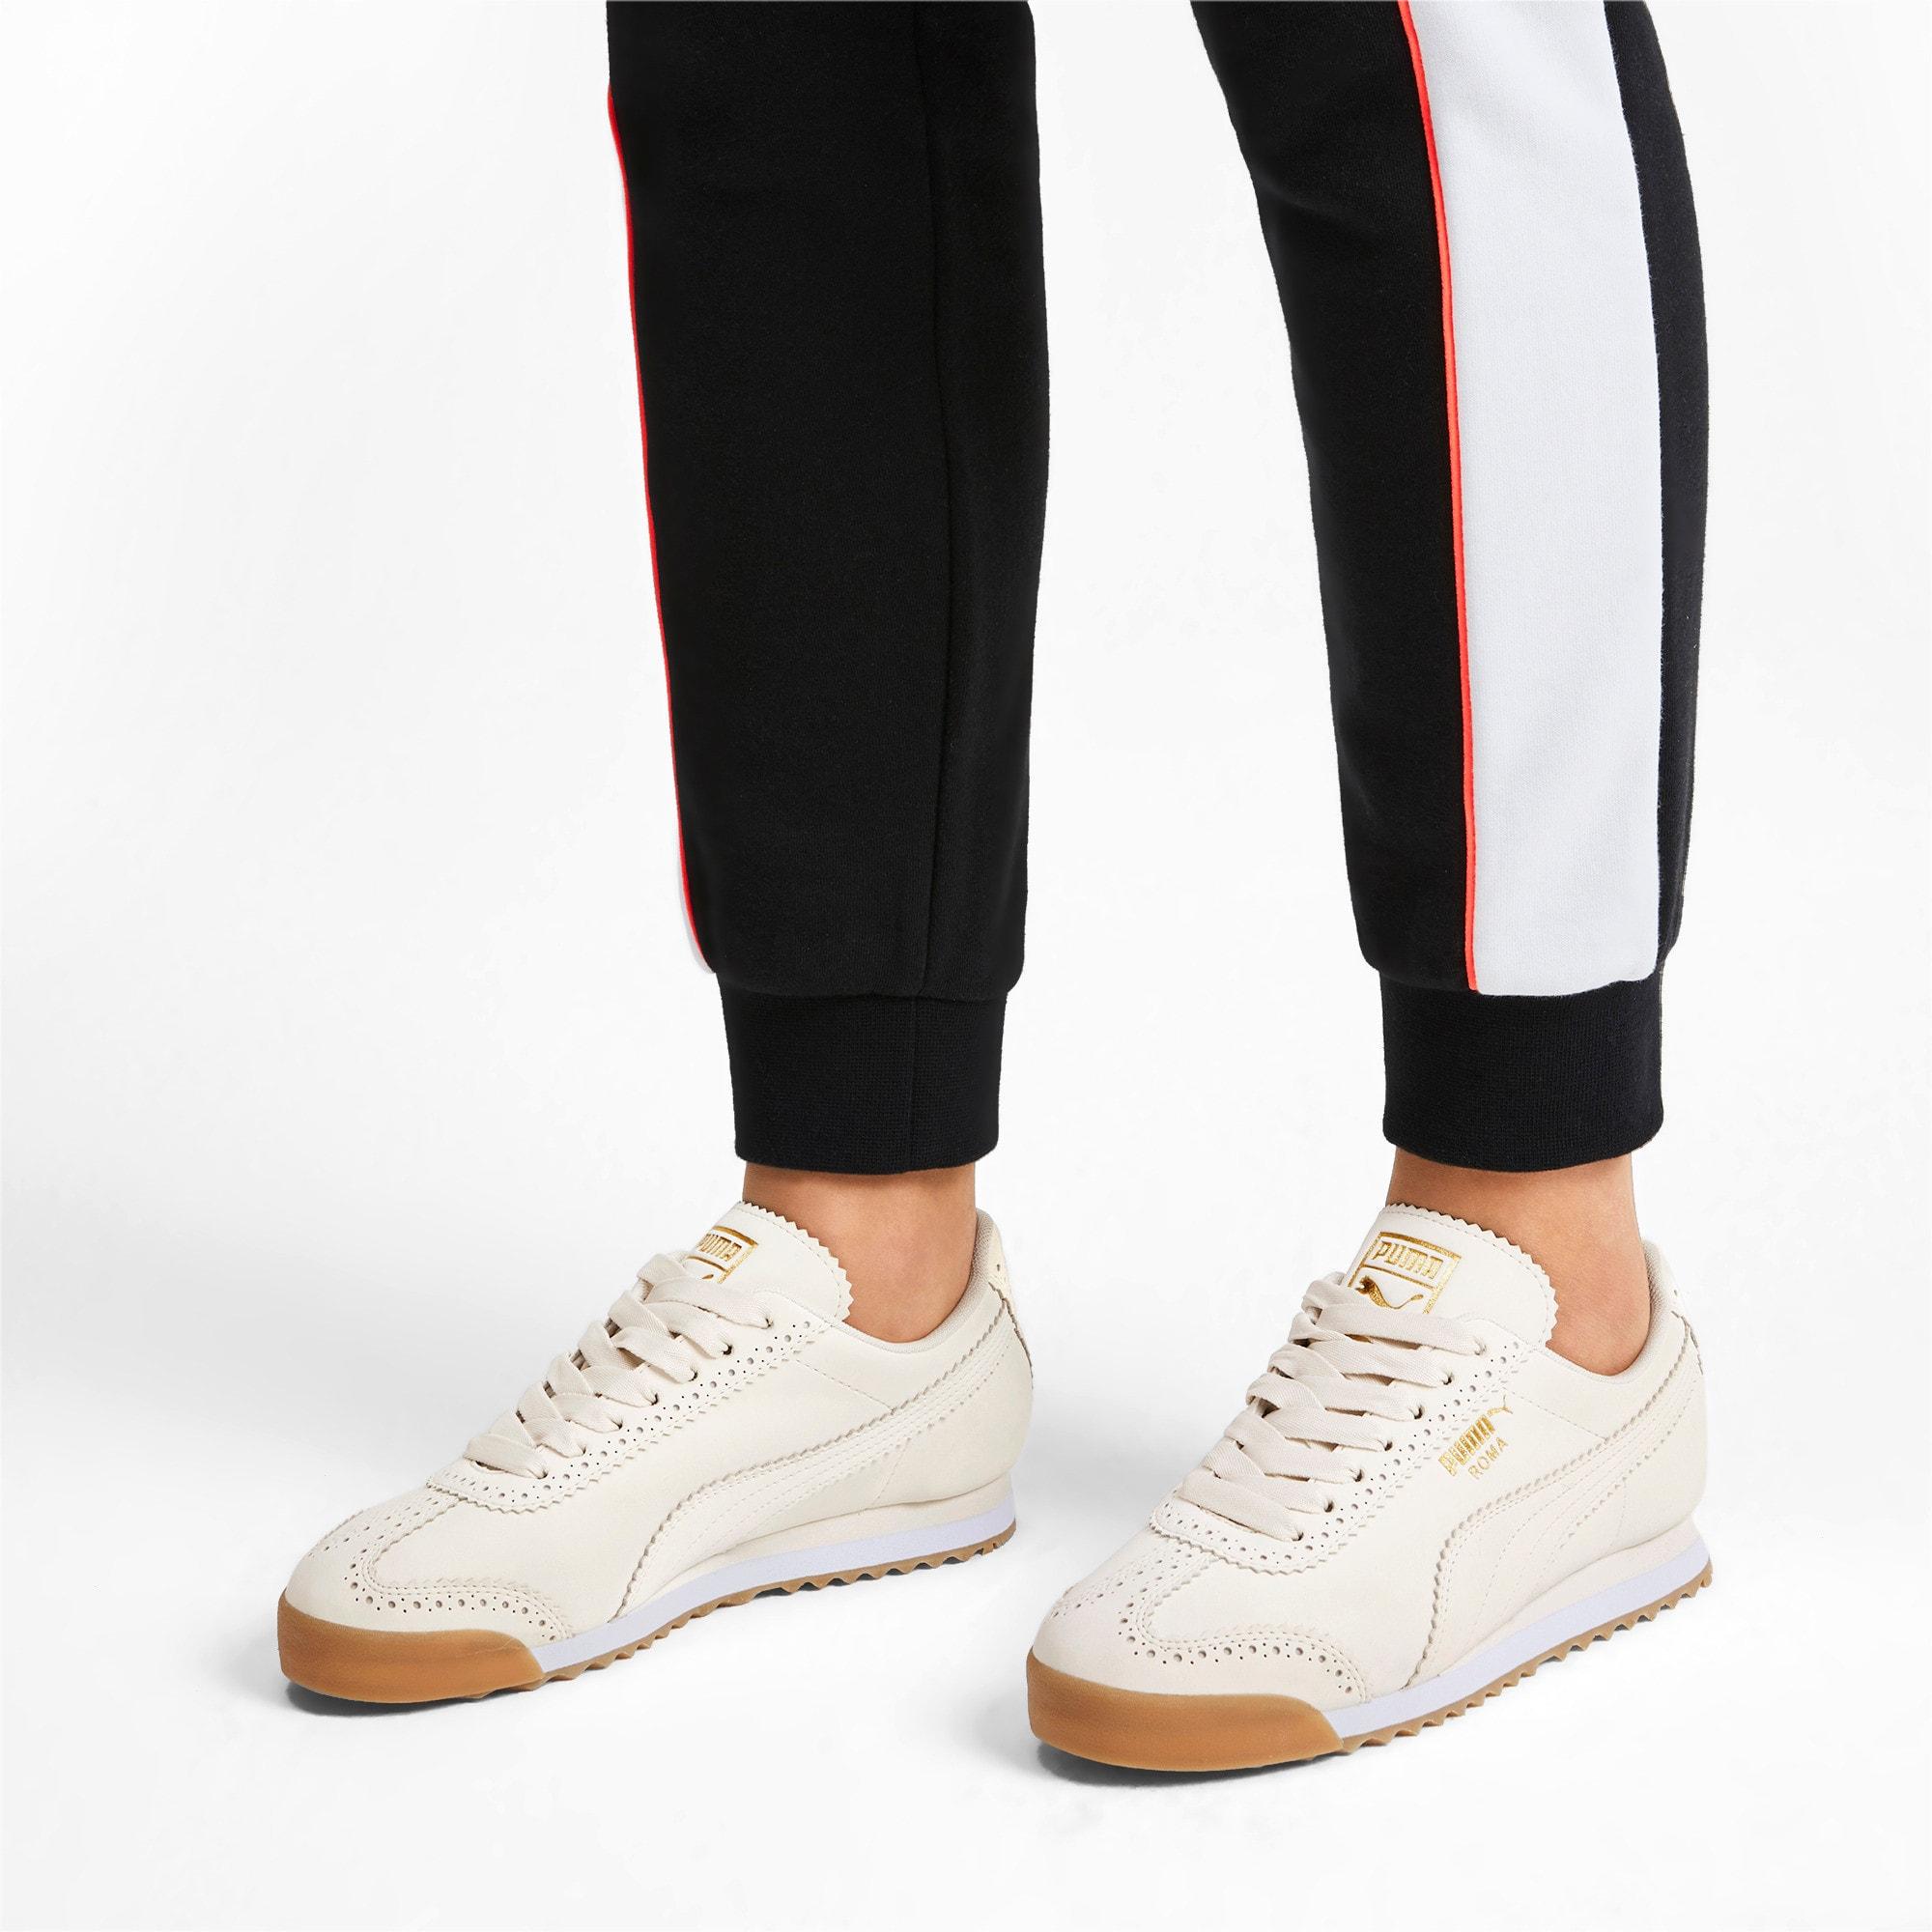 Miniatura 3 de Zapatos deportivos Roma Brogue para mujer, Pastel Parchment-P.Team Gold, mediano